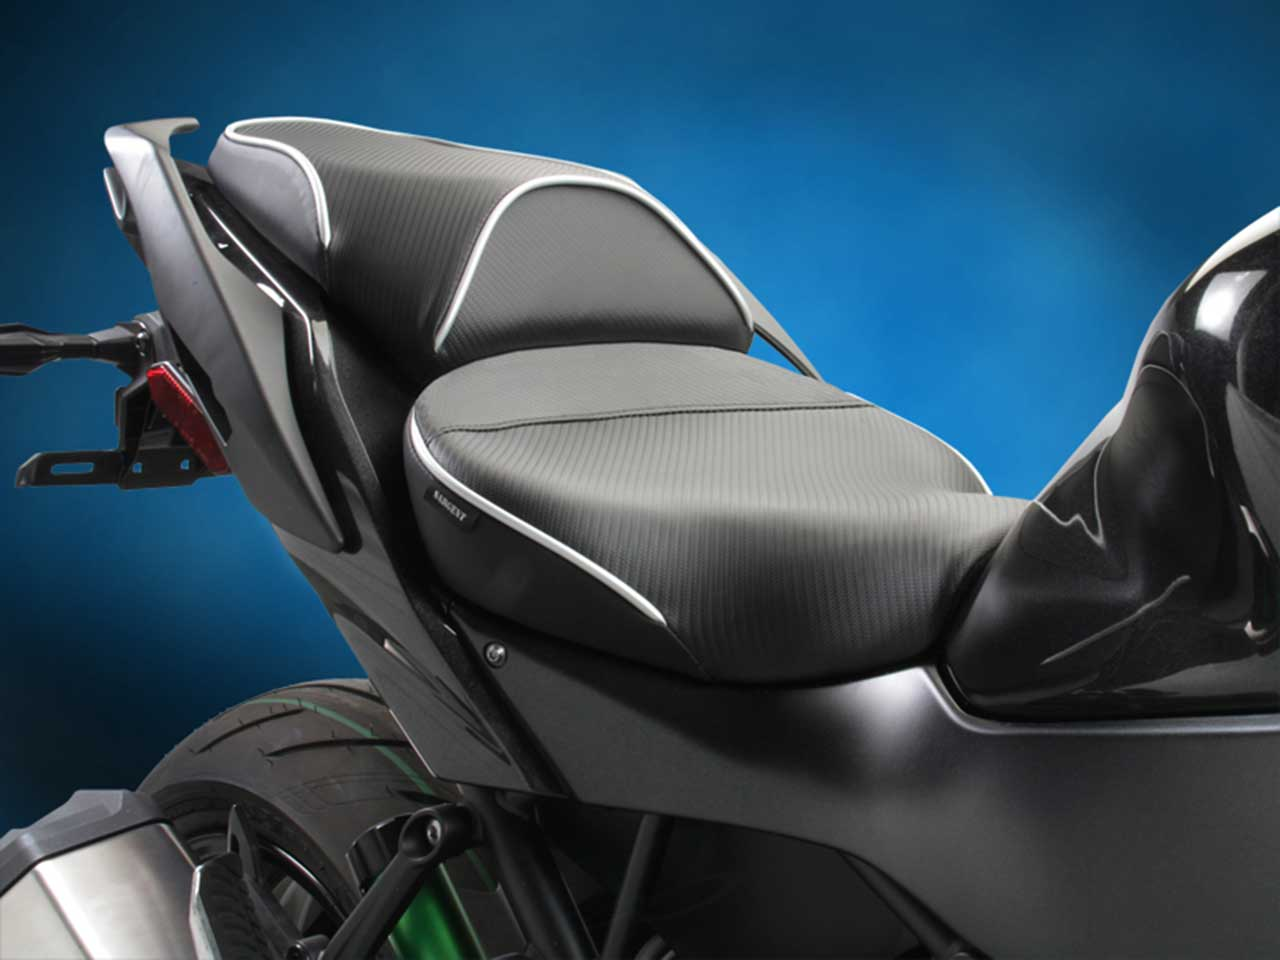 Sargent ワールドスポーツ パフォーマンスシート Kawasaki Ninja H2 SX / SX-SE / SX-SE+